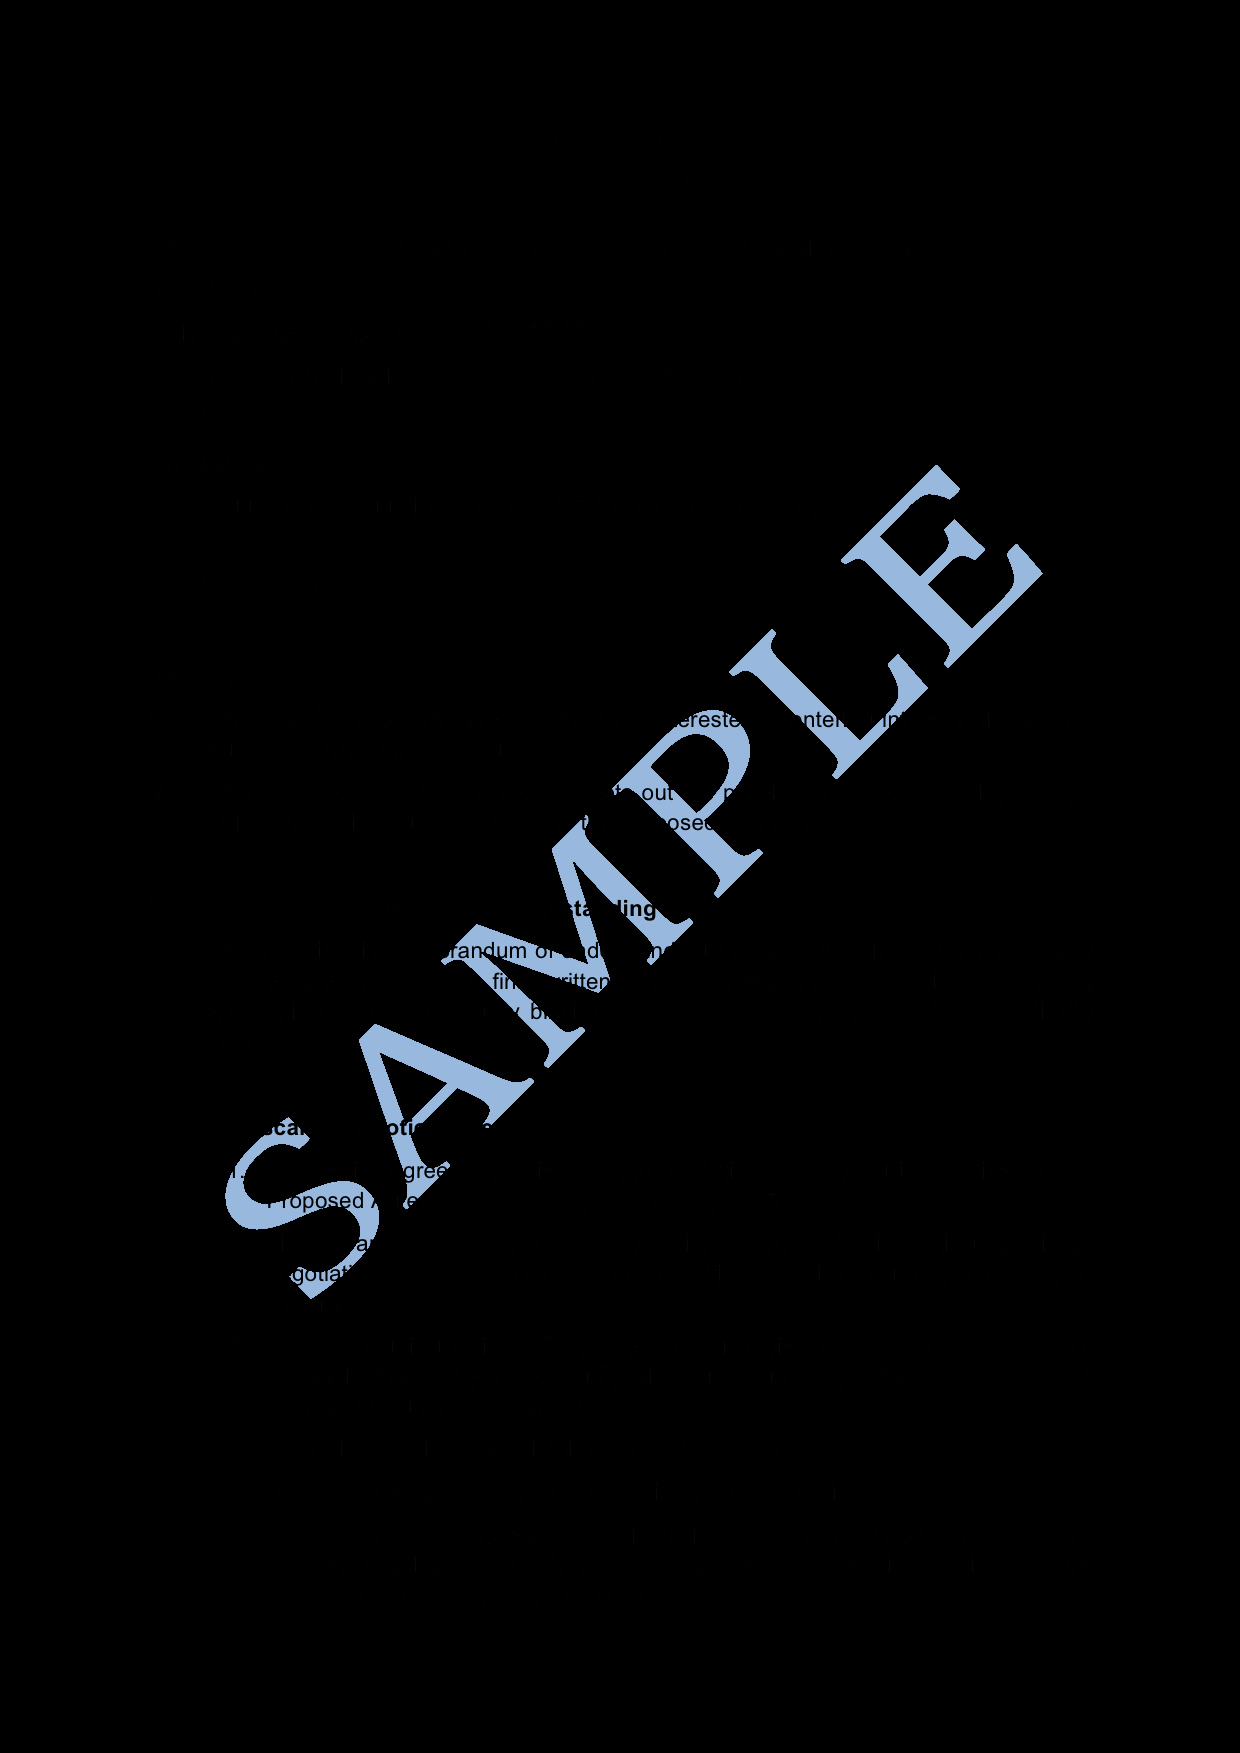 Memorandum Of Agreement Template Unique Memorandum Of Understanding Sample Lawpath